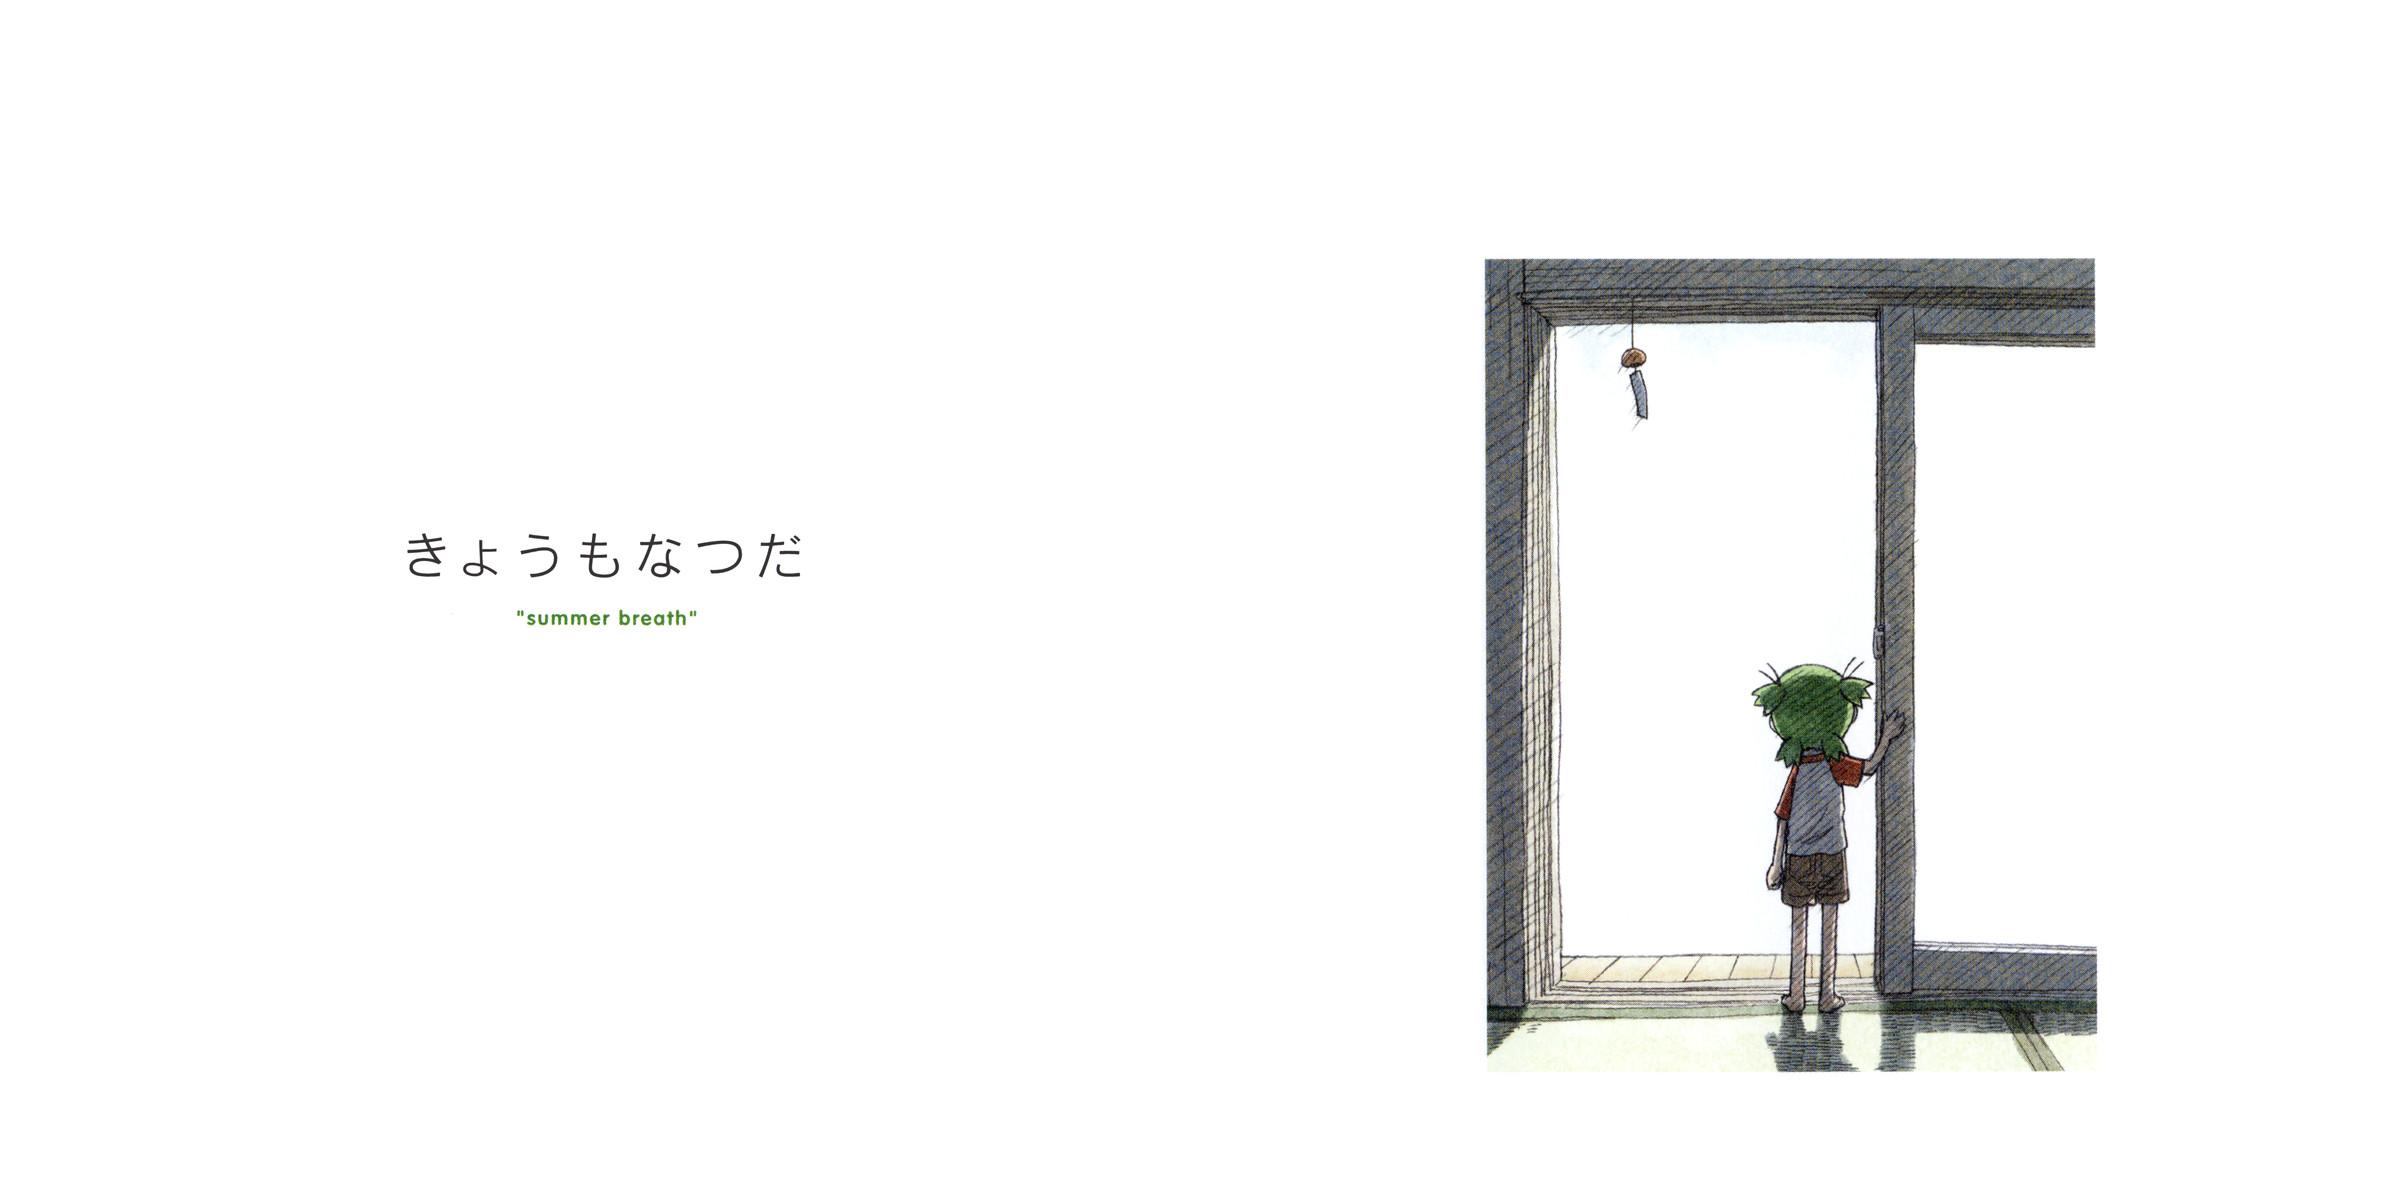 Yotsuba Kuricorder Pops Orchestra Mp3